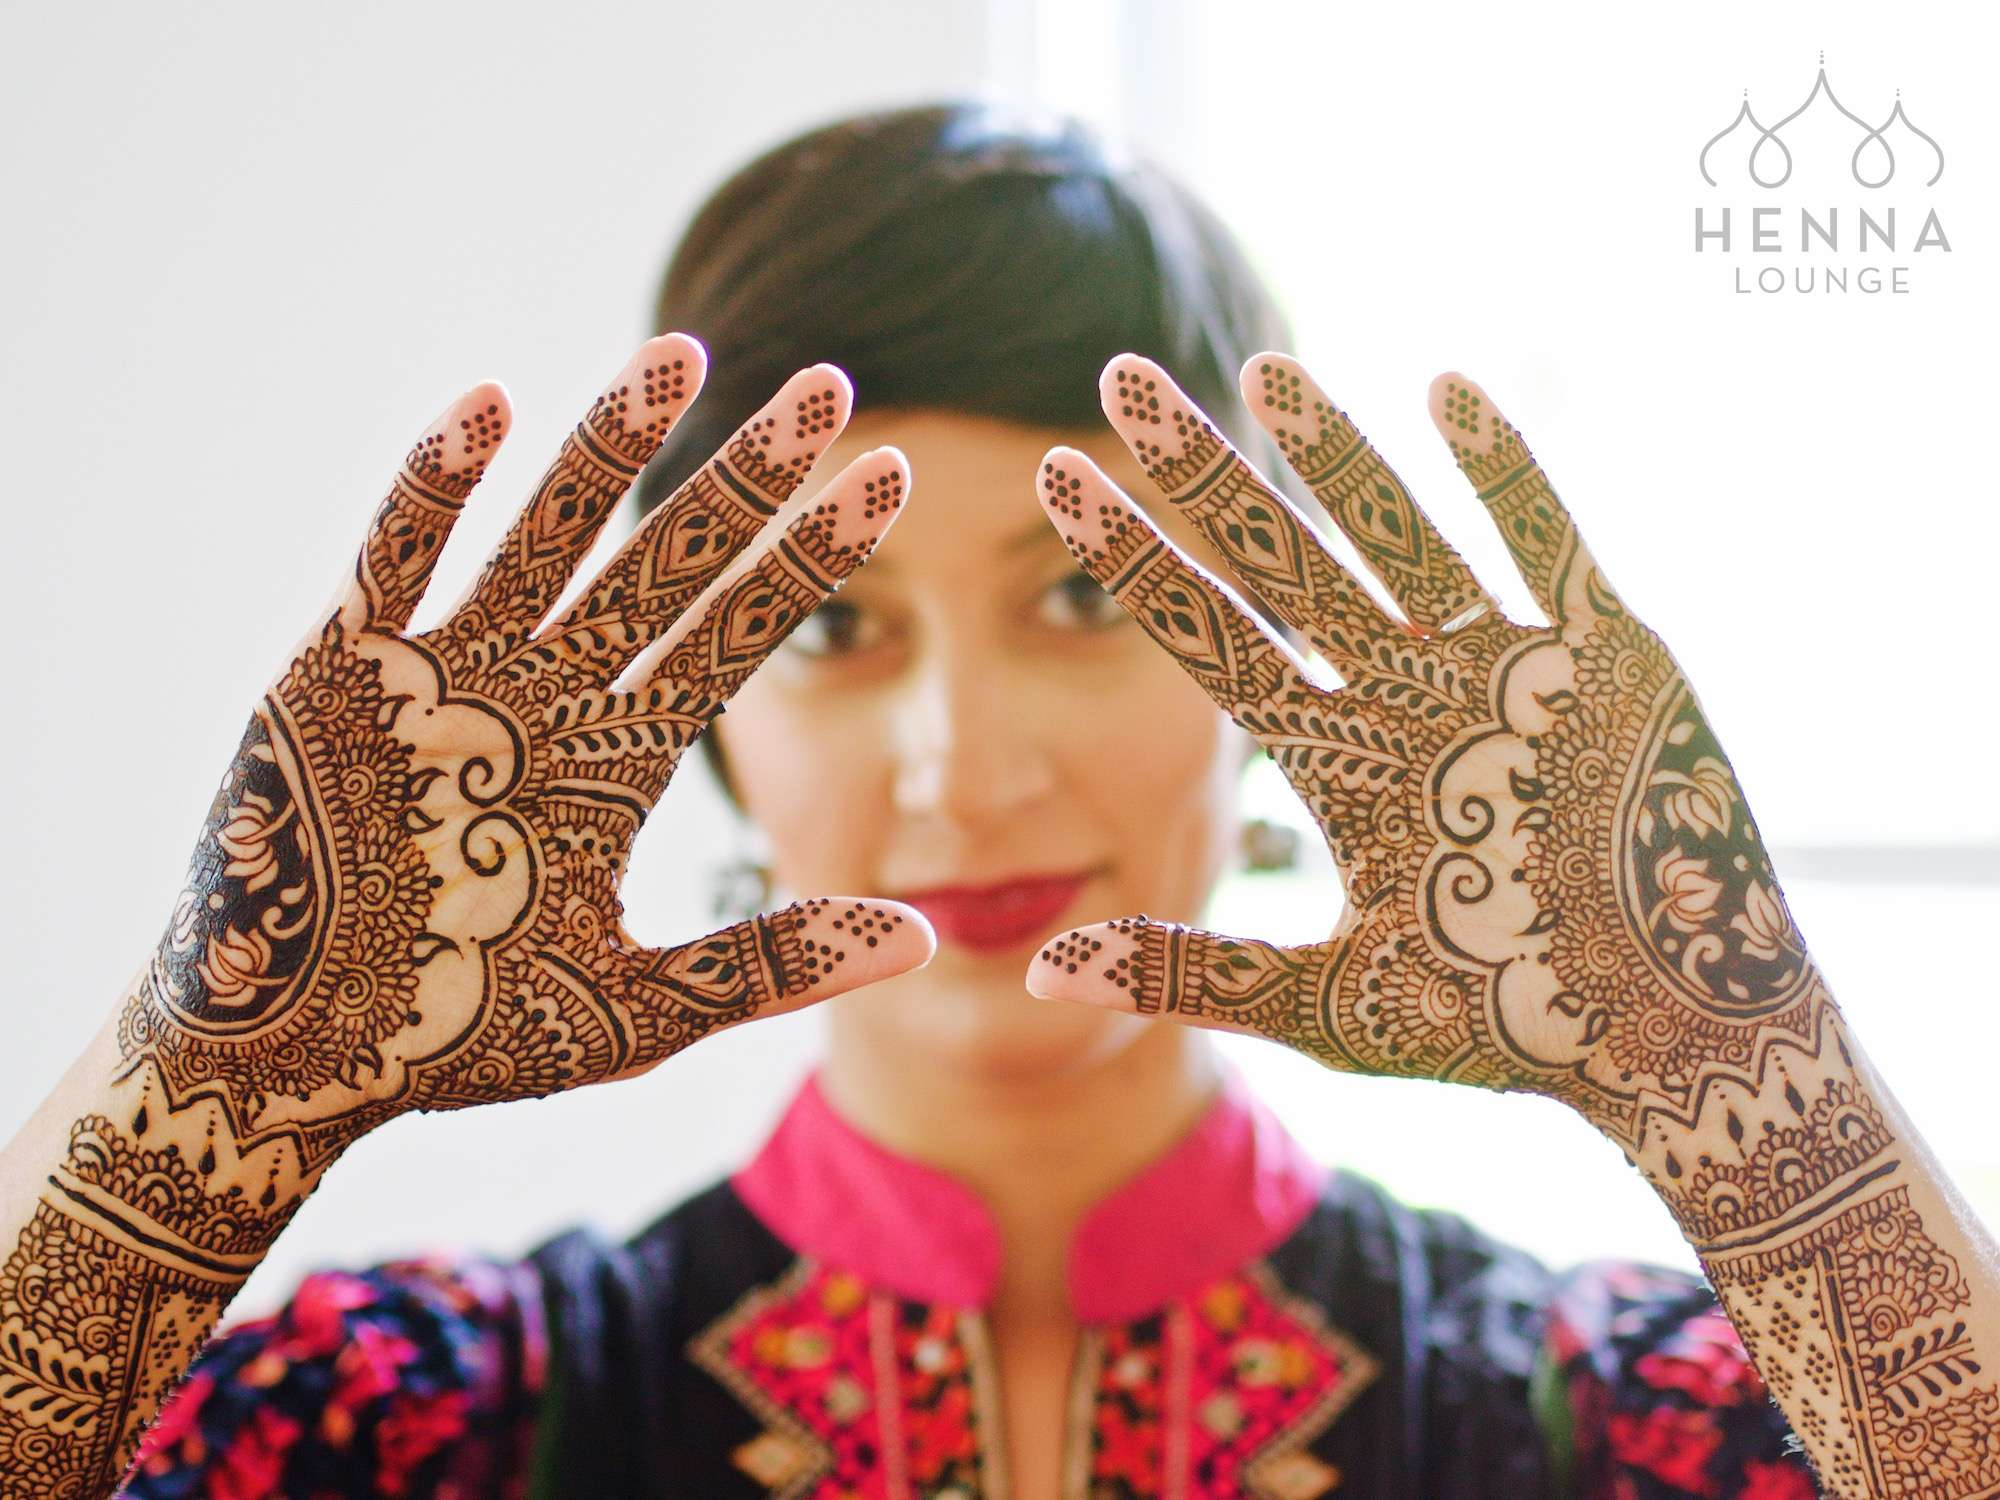 peekaboo henna by www.hennalounge.com